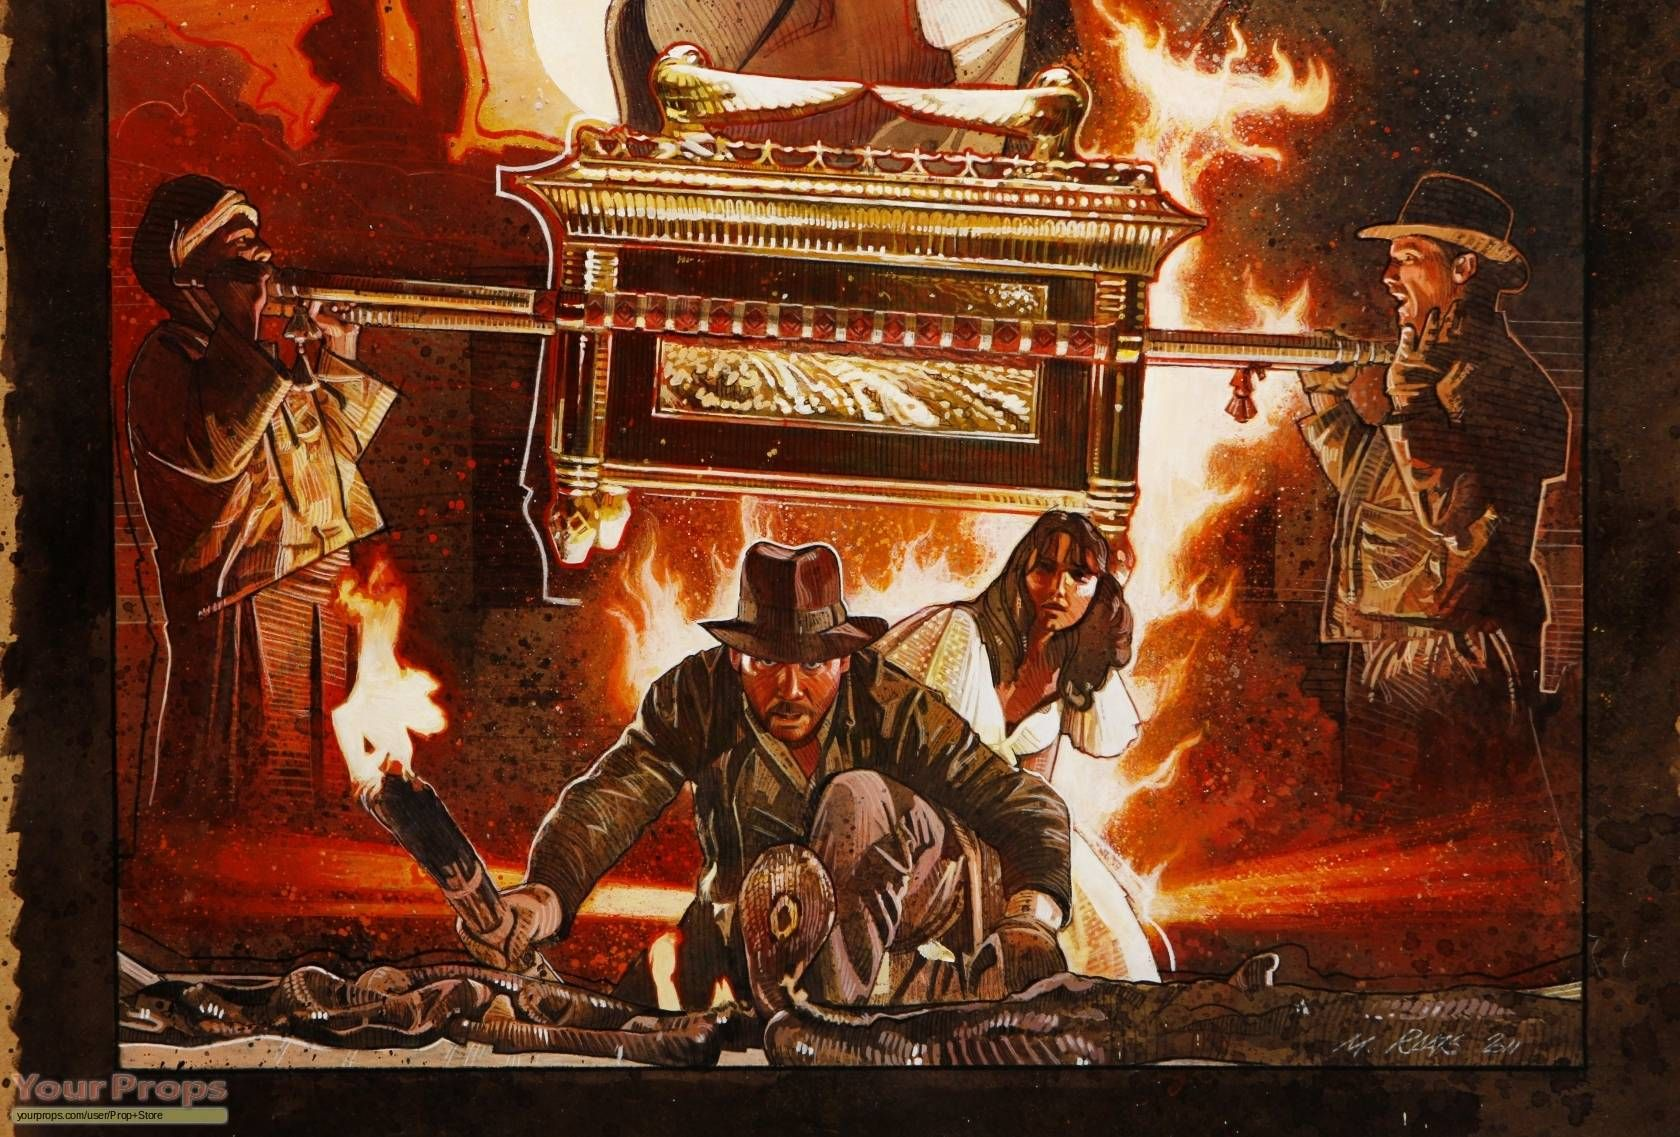 Raiders of the Lost Ark Wallpaper 2   Indiana Jones Wallpaper 1680x1137